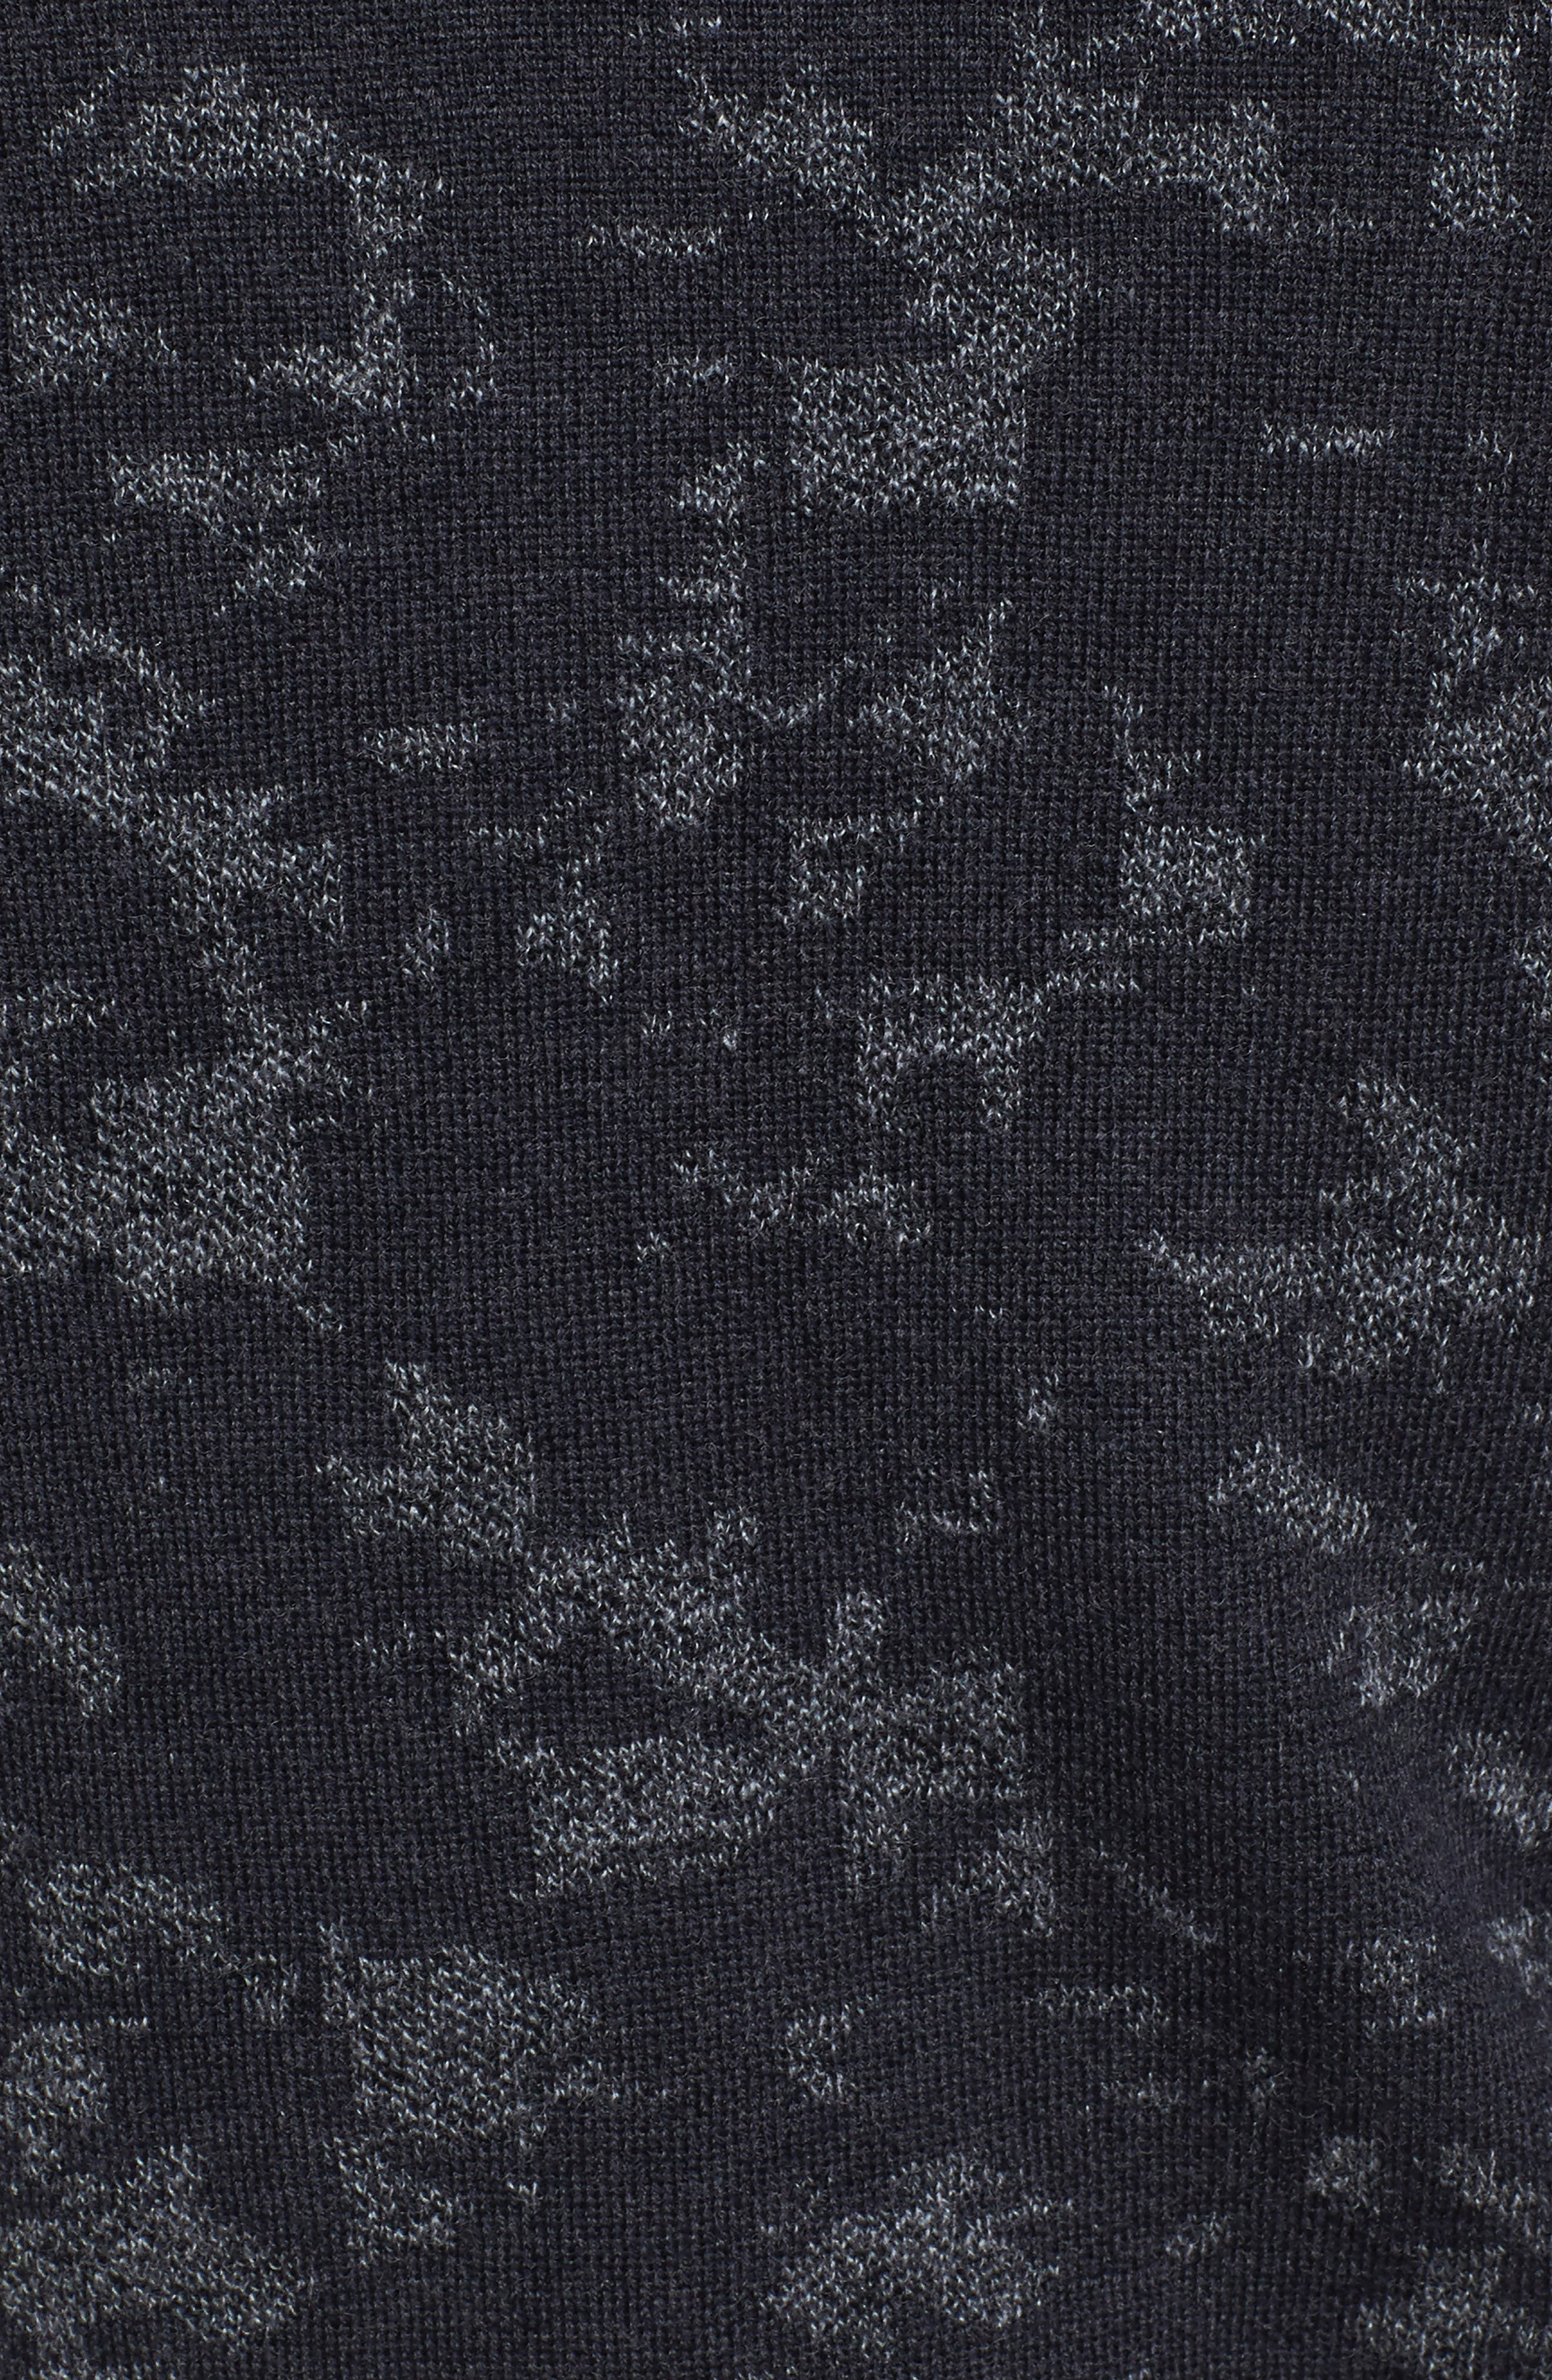 Gelato Jacquard Sweater,                             Alternate thumbnail 5, color,                             020